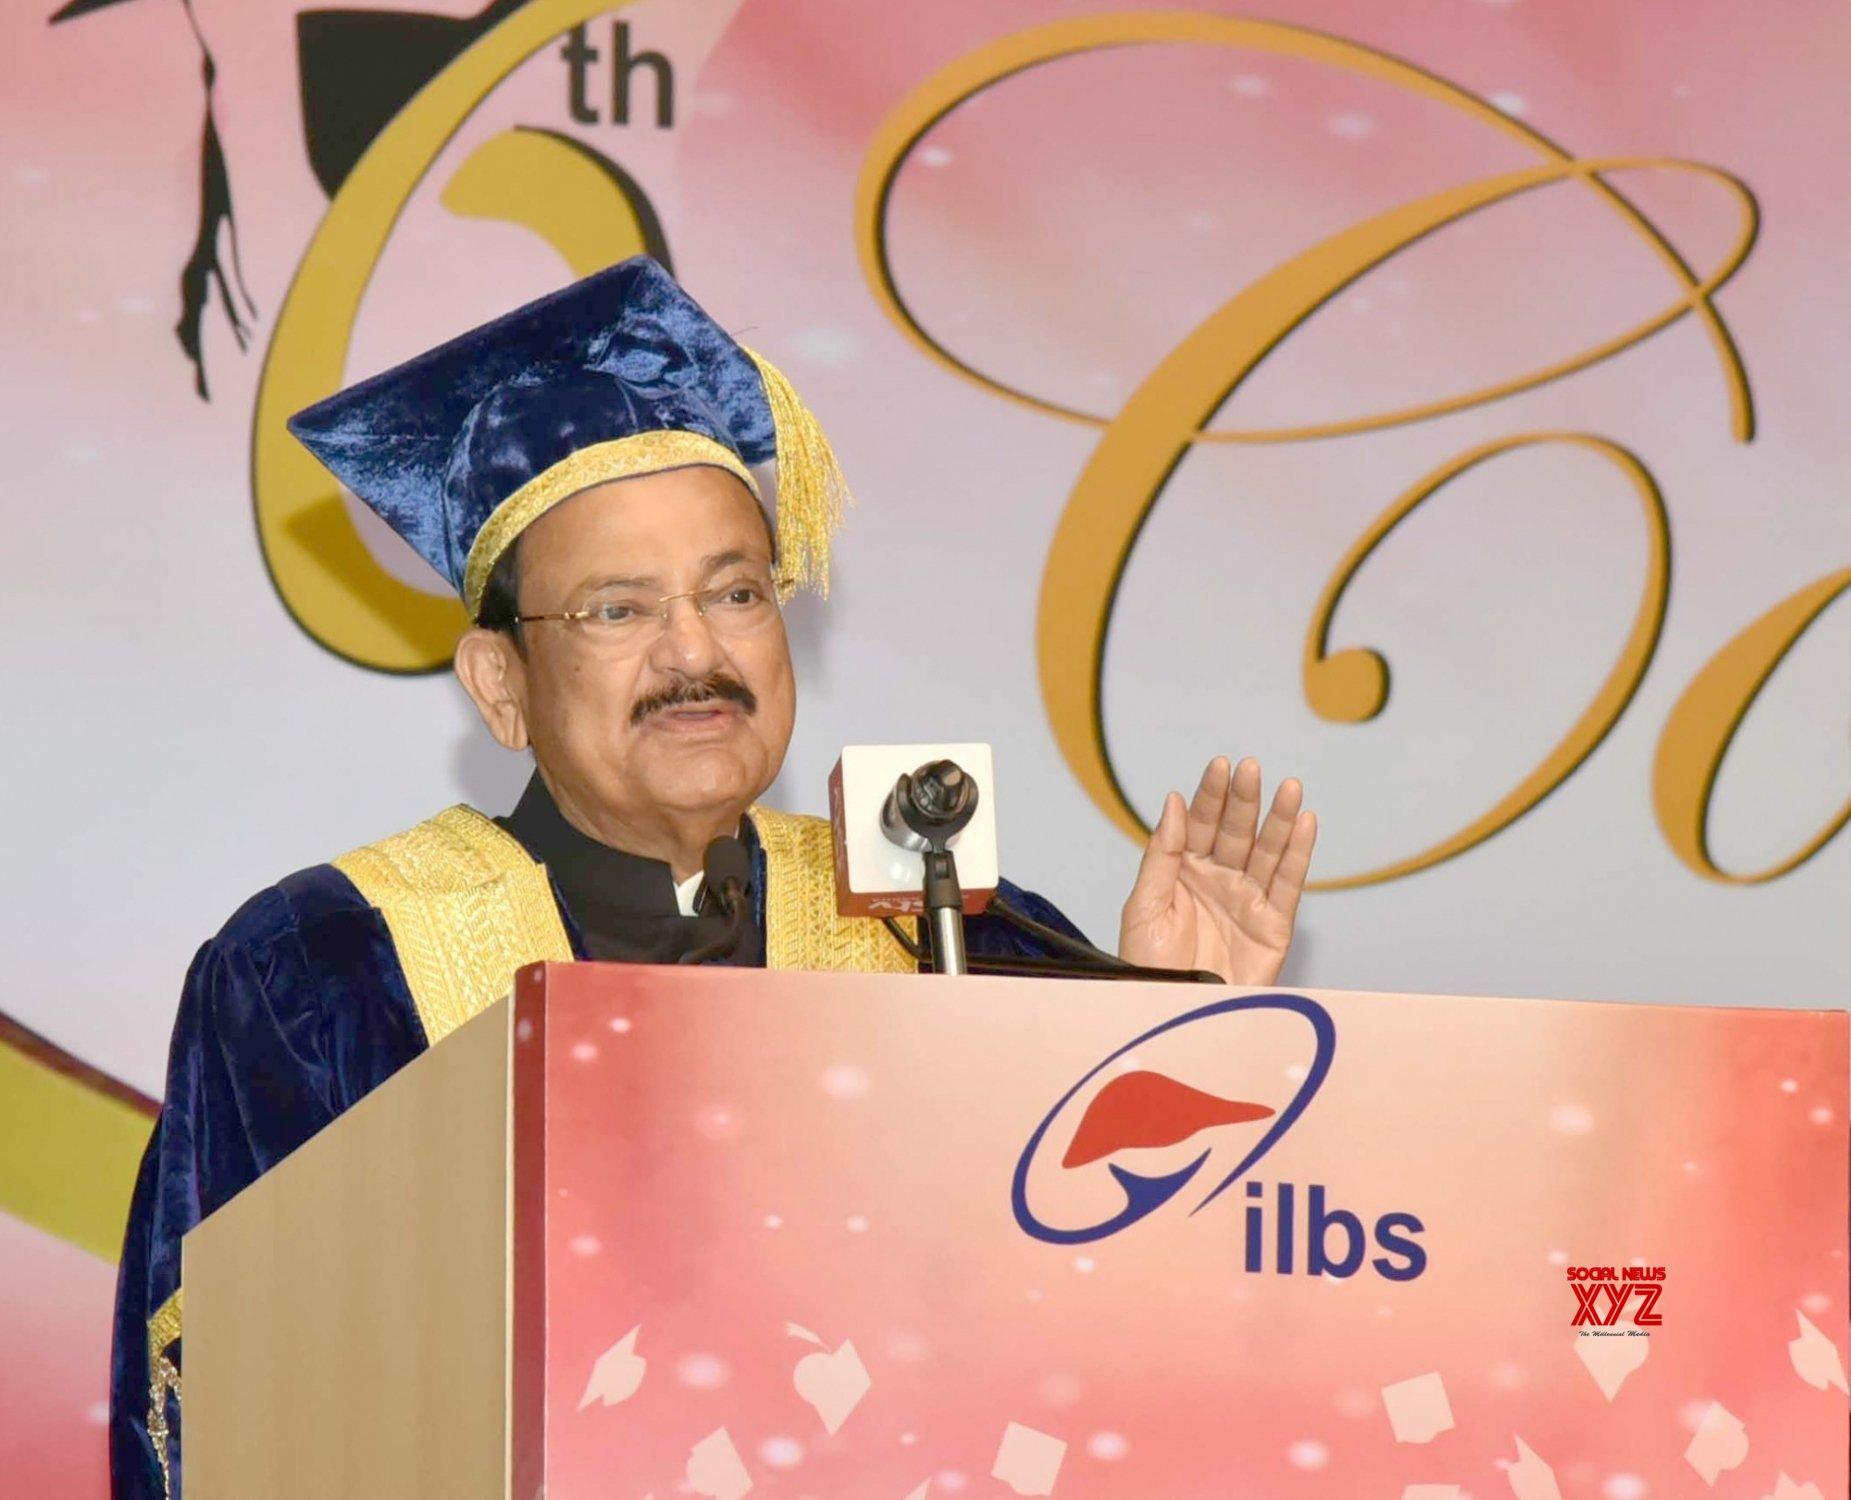 New Delhi: Venkaiah Naidu addresses at ILBS Convocation #Gallery